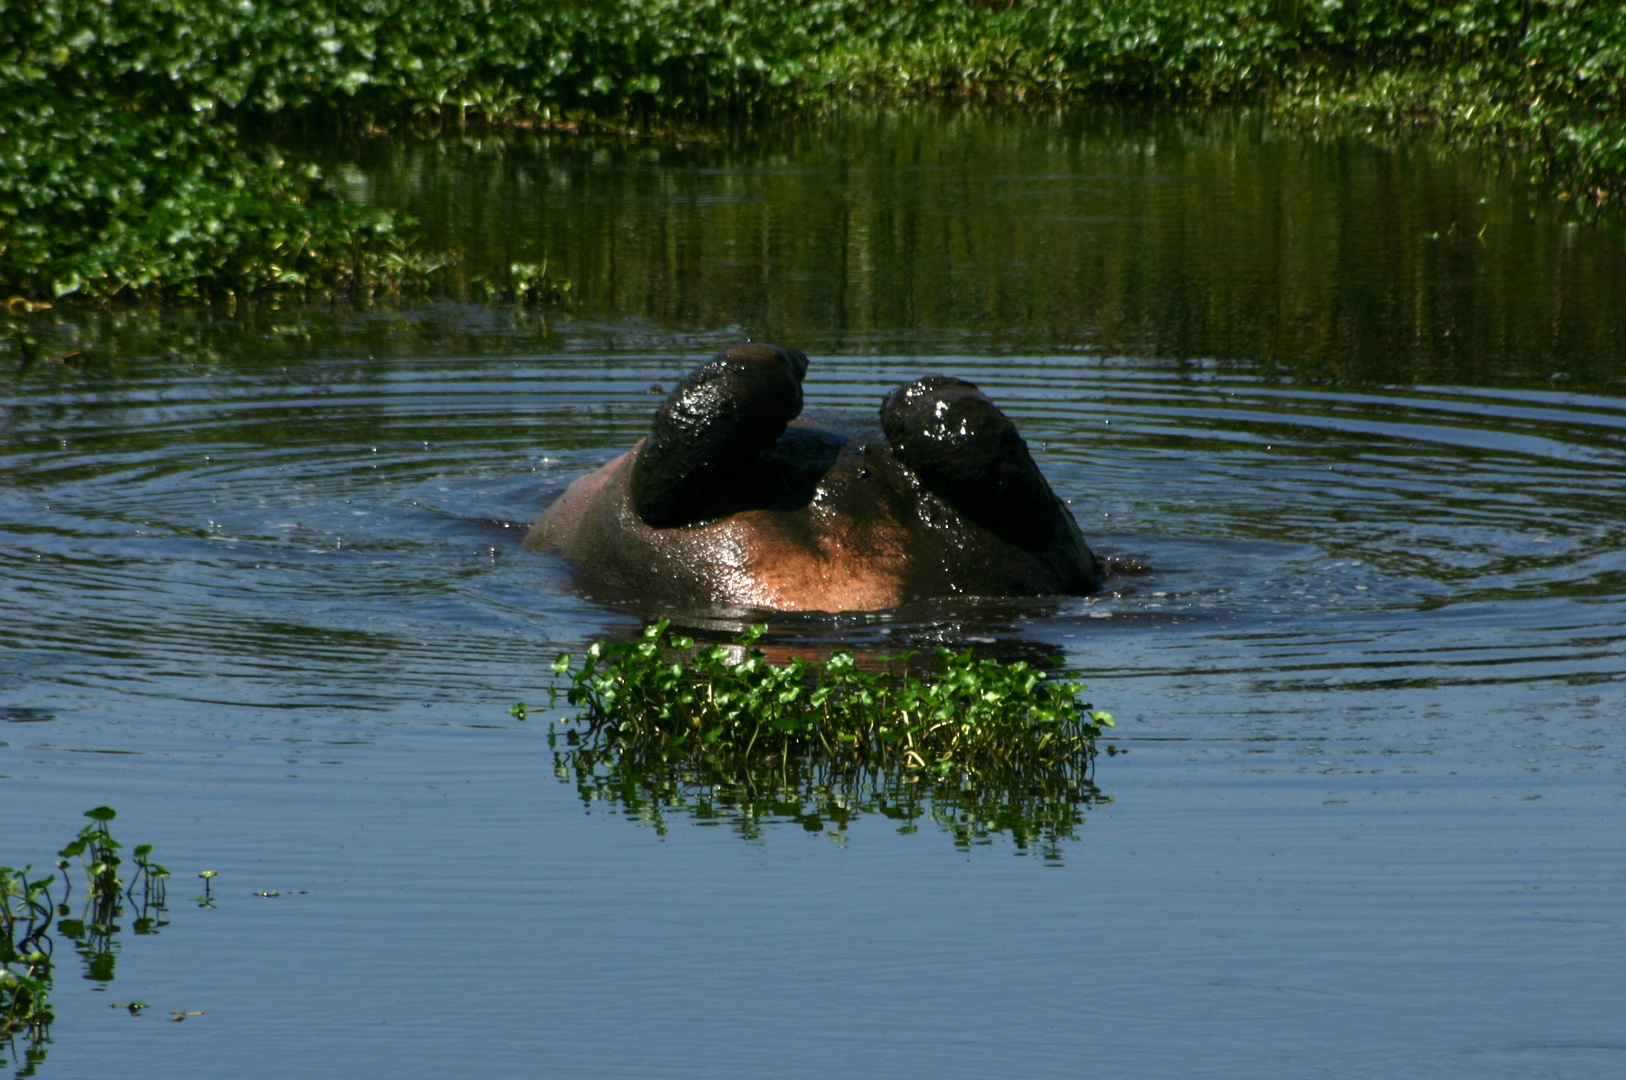 Nilpferd-Swimmingpool 2